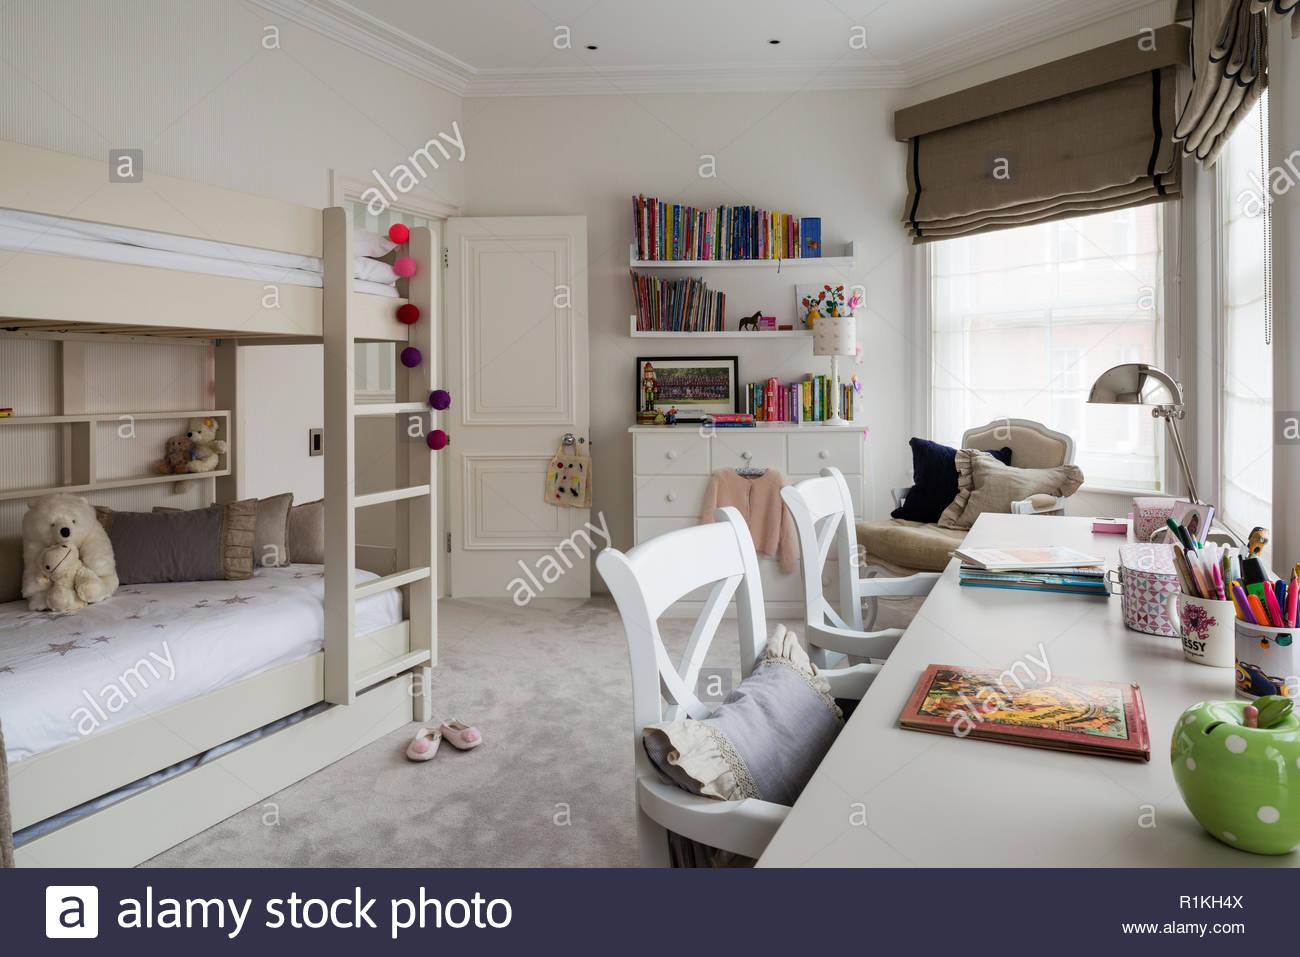 Etagenbetten Kinderzimmer : Etagenbett im kinderzimmer stockfoto bild: 224779994 alamy